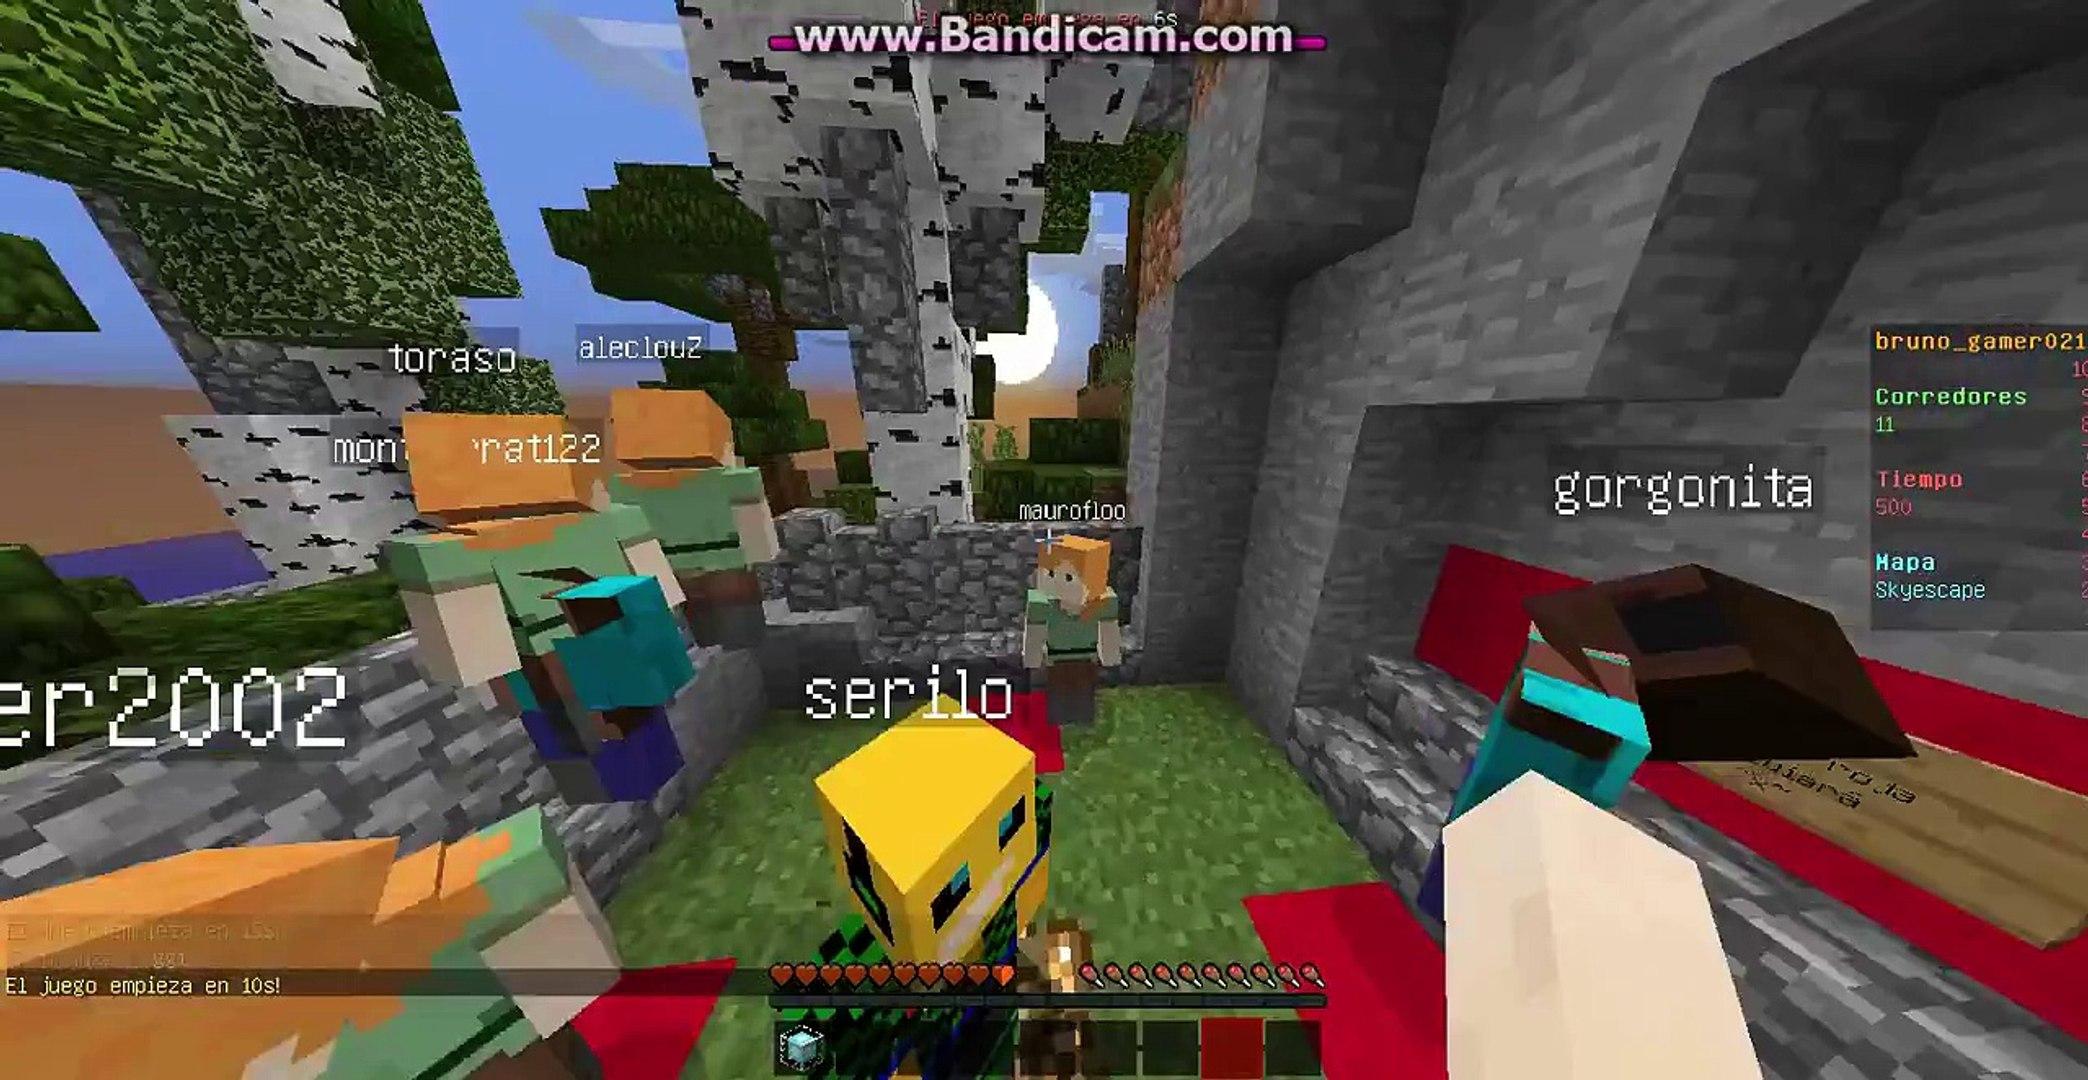 Minecraft #1 Que bosta de mapa de Parkour